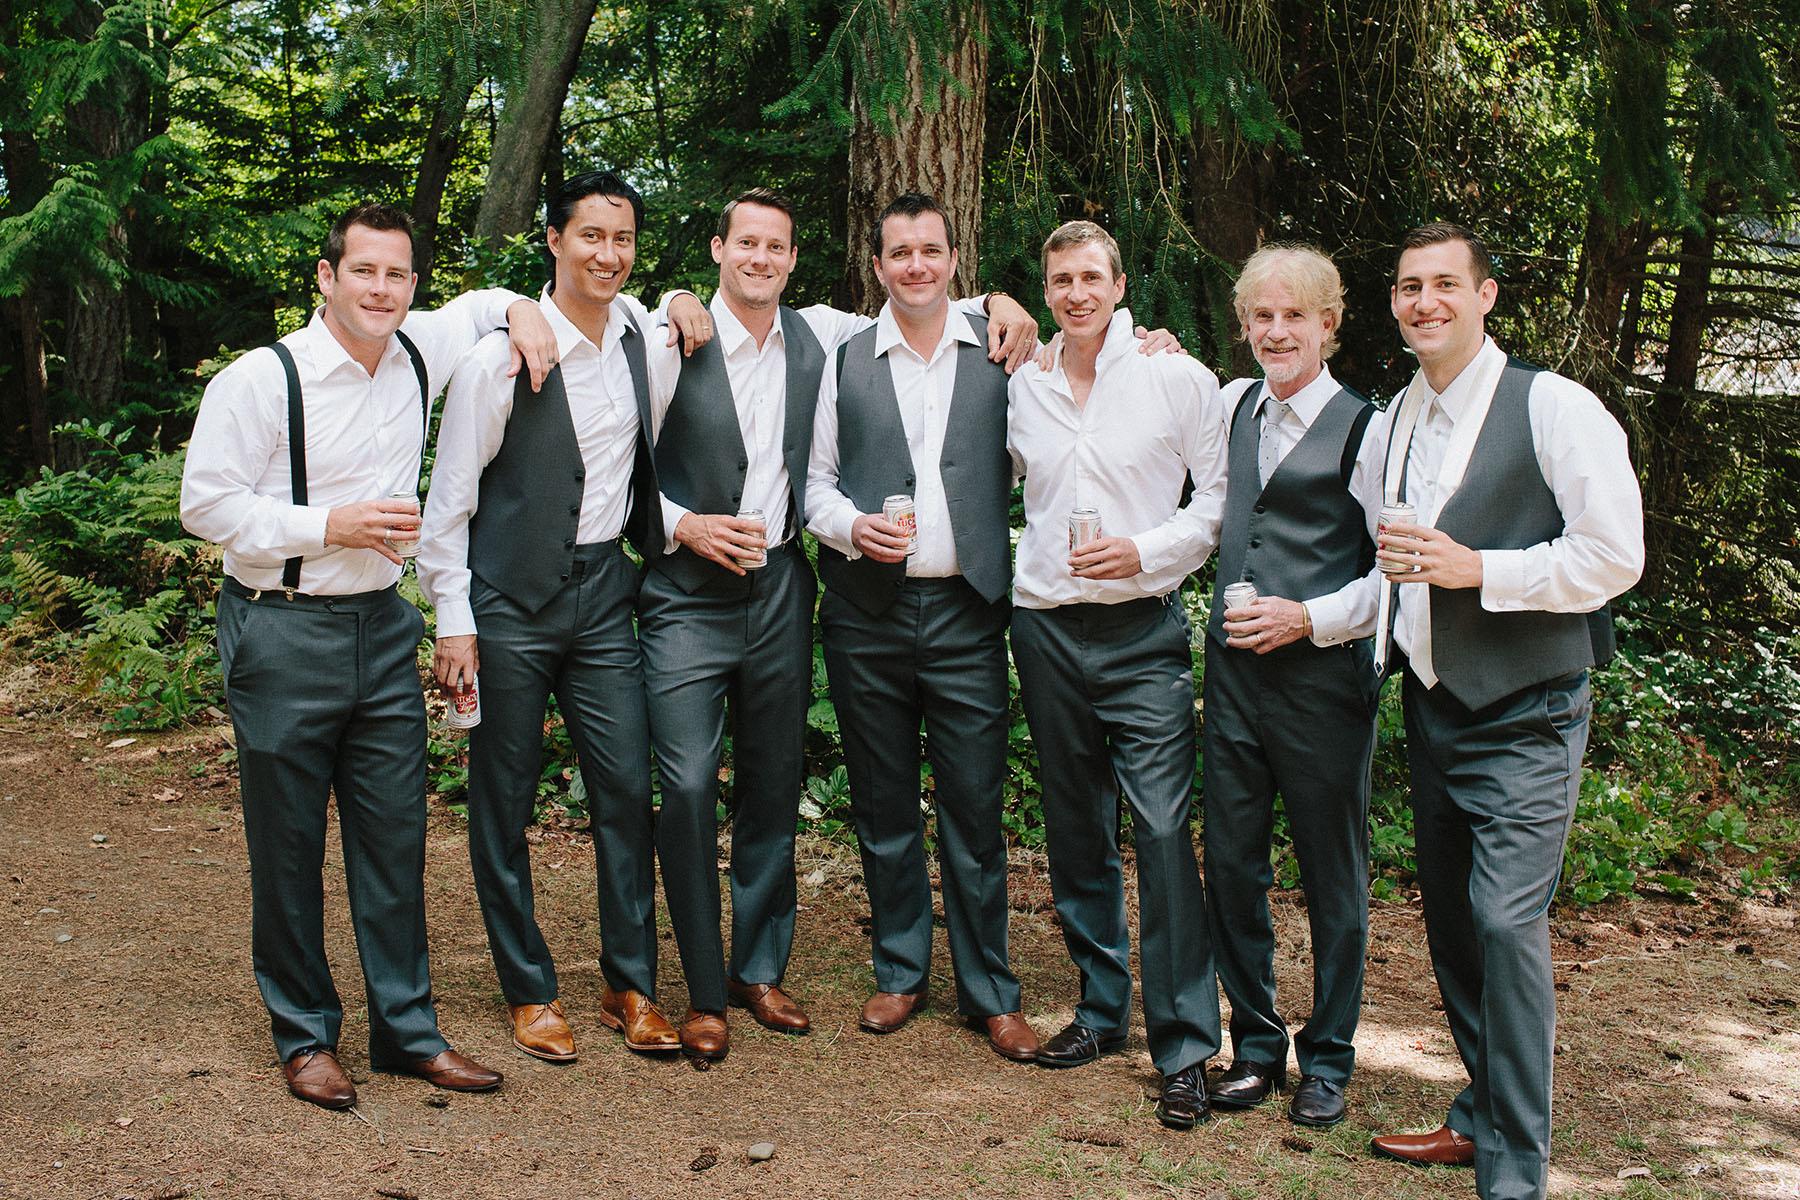 thetis-island-wedding-photographer-rp-rn-026.jpg